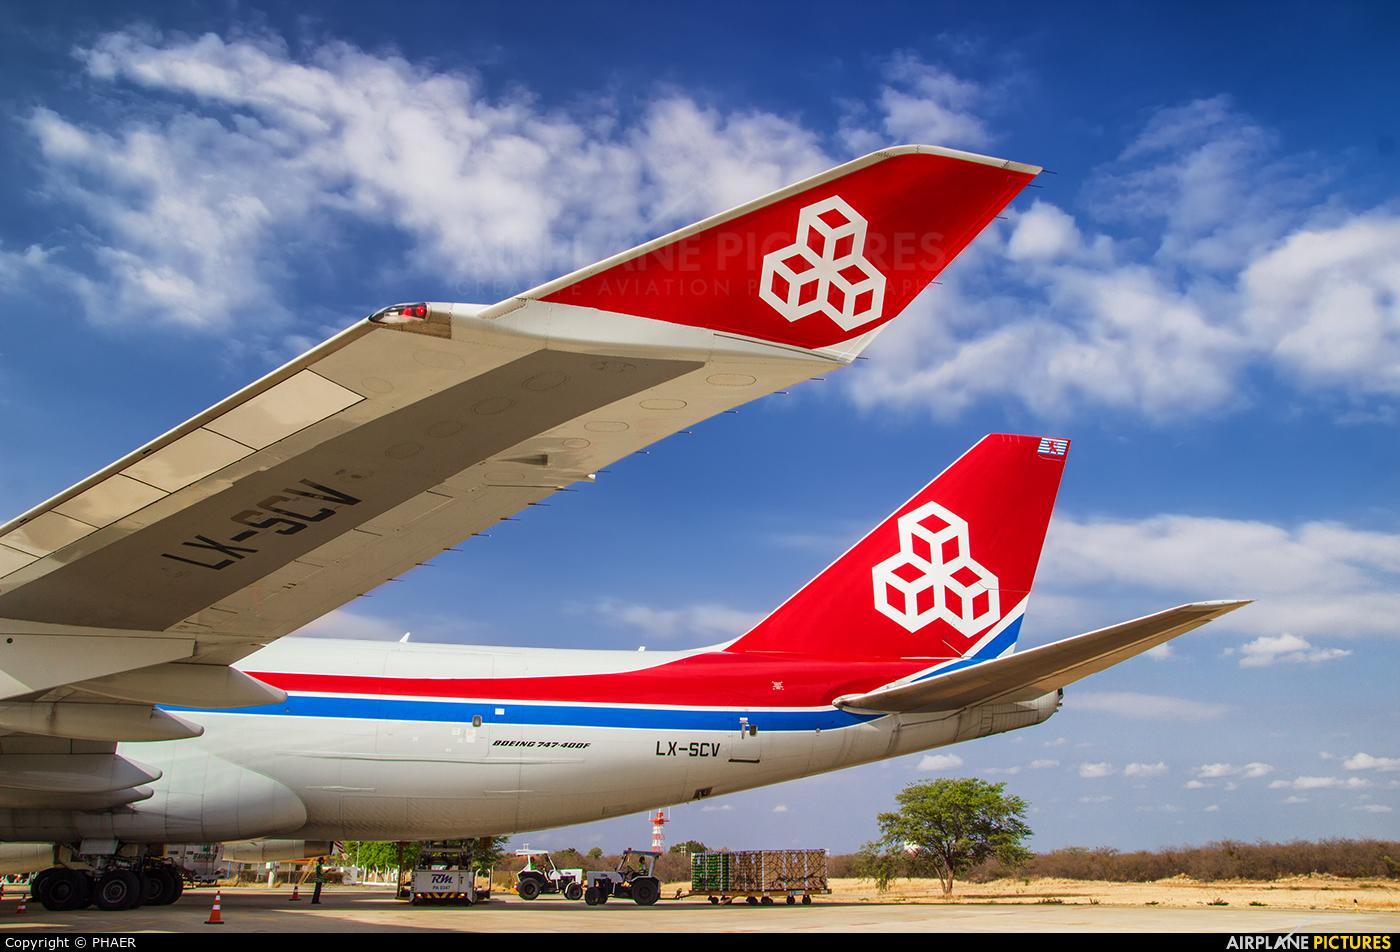 Cargolux LX-SCV aircraft at Petrolina